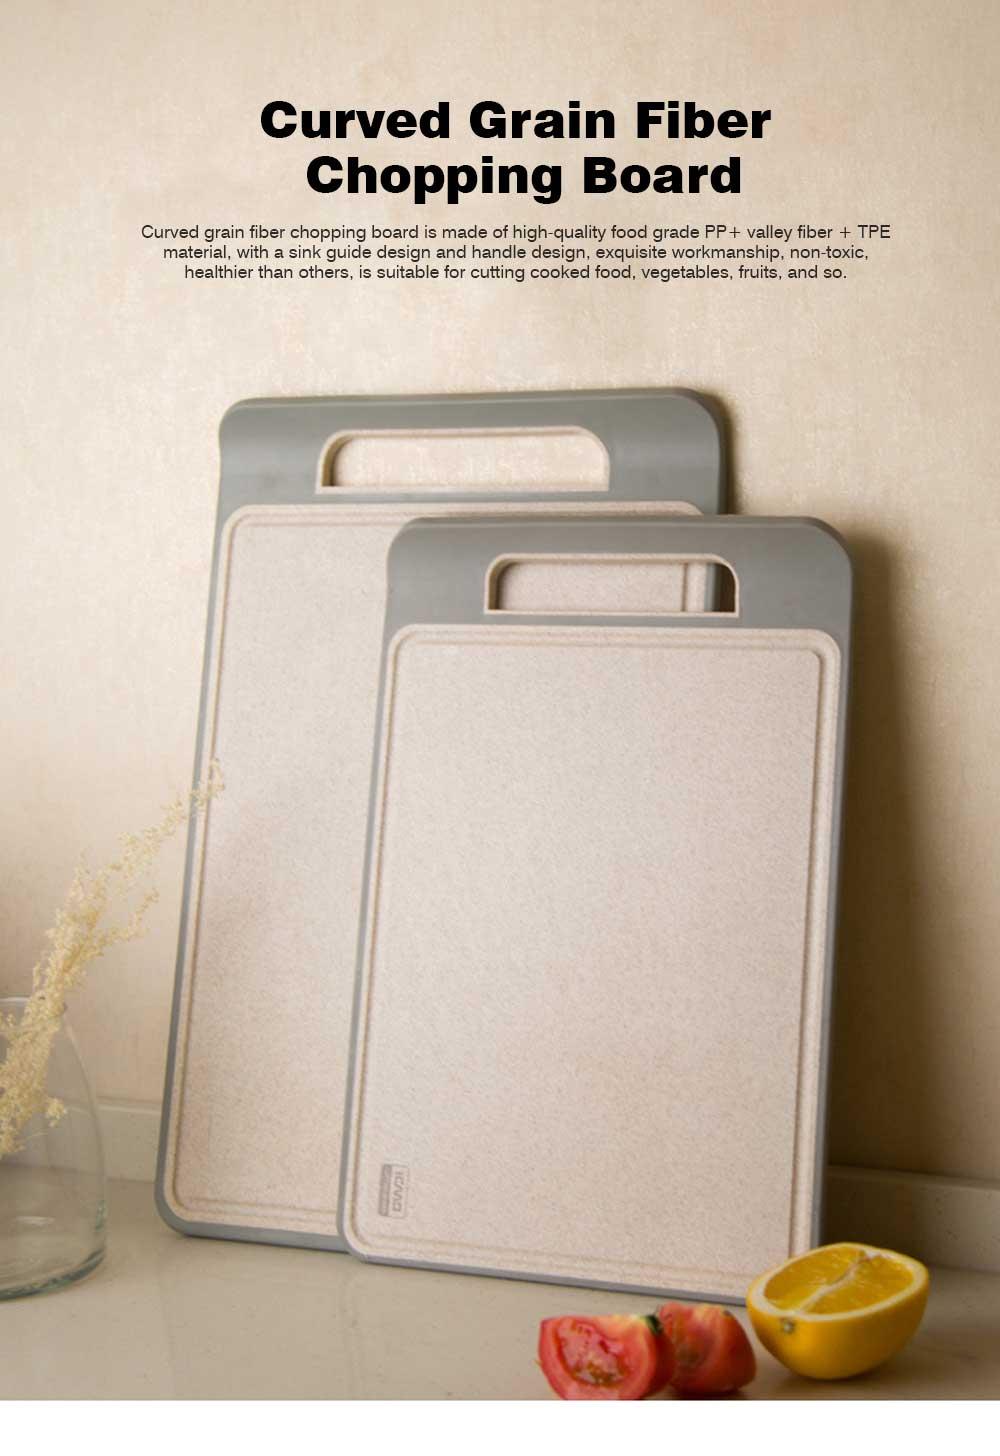 Curved Grain Fiber Chopping Board, Non-slip Cutting Board with L-shaped Handle Design 0